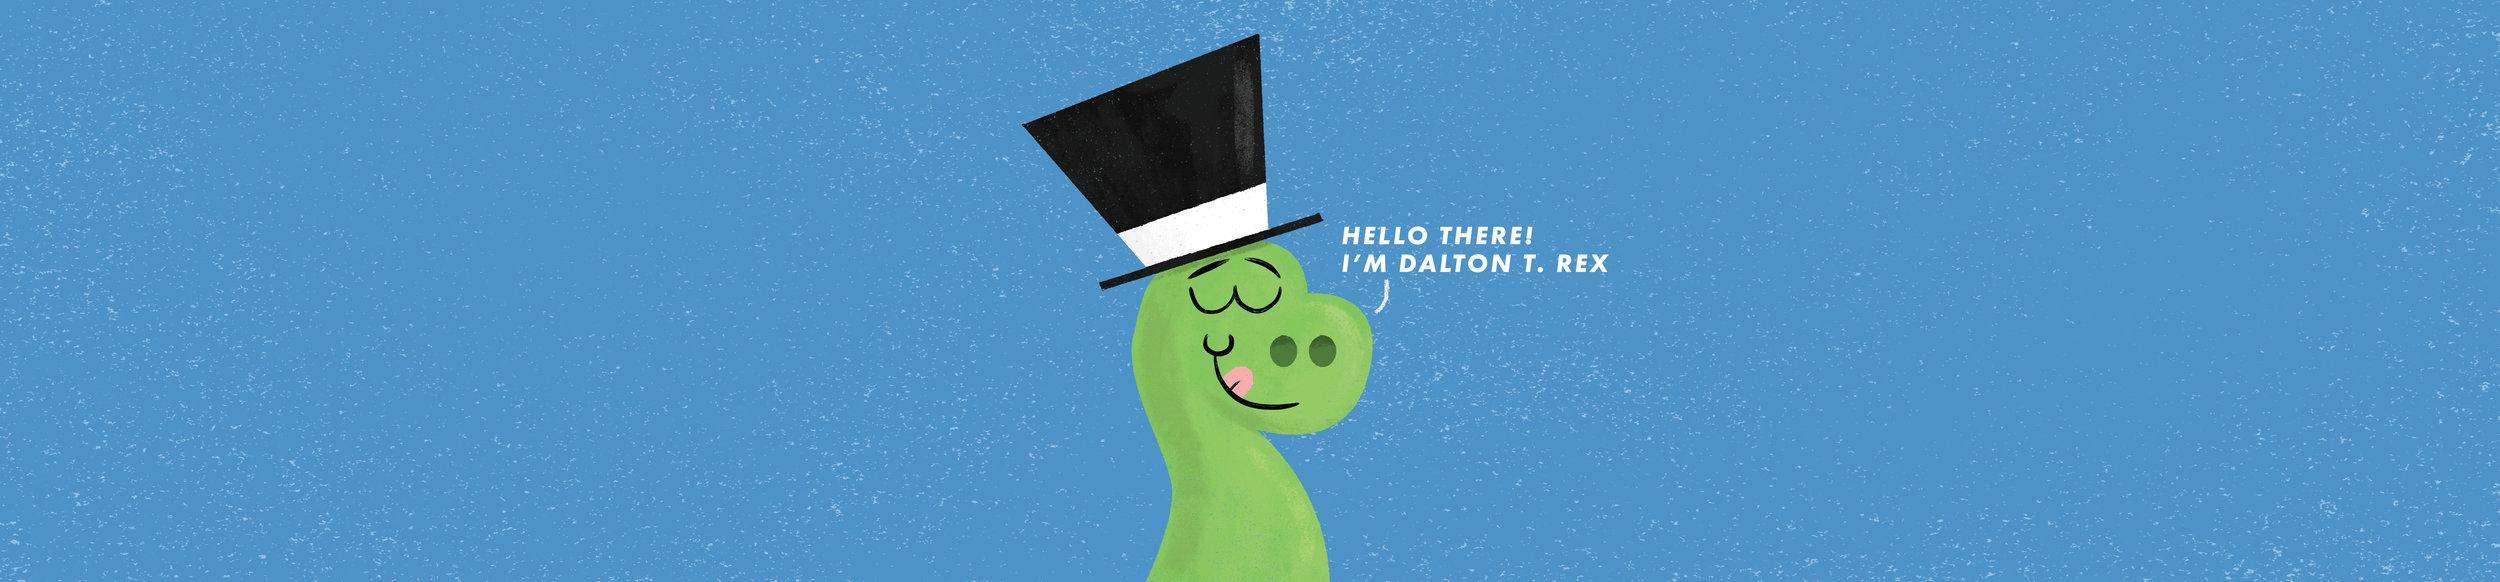 Dalton-NEW-WebLocked.jpg